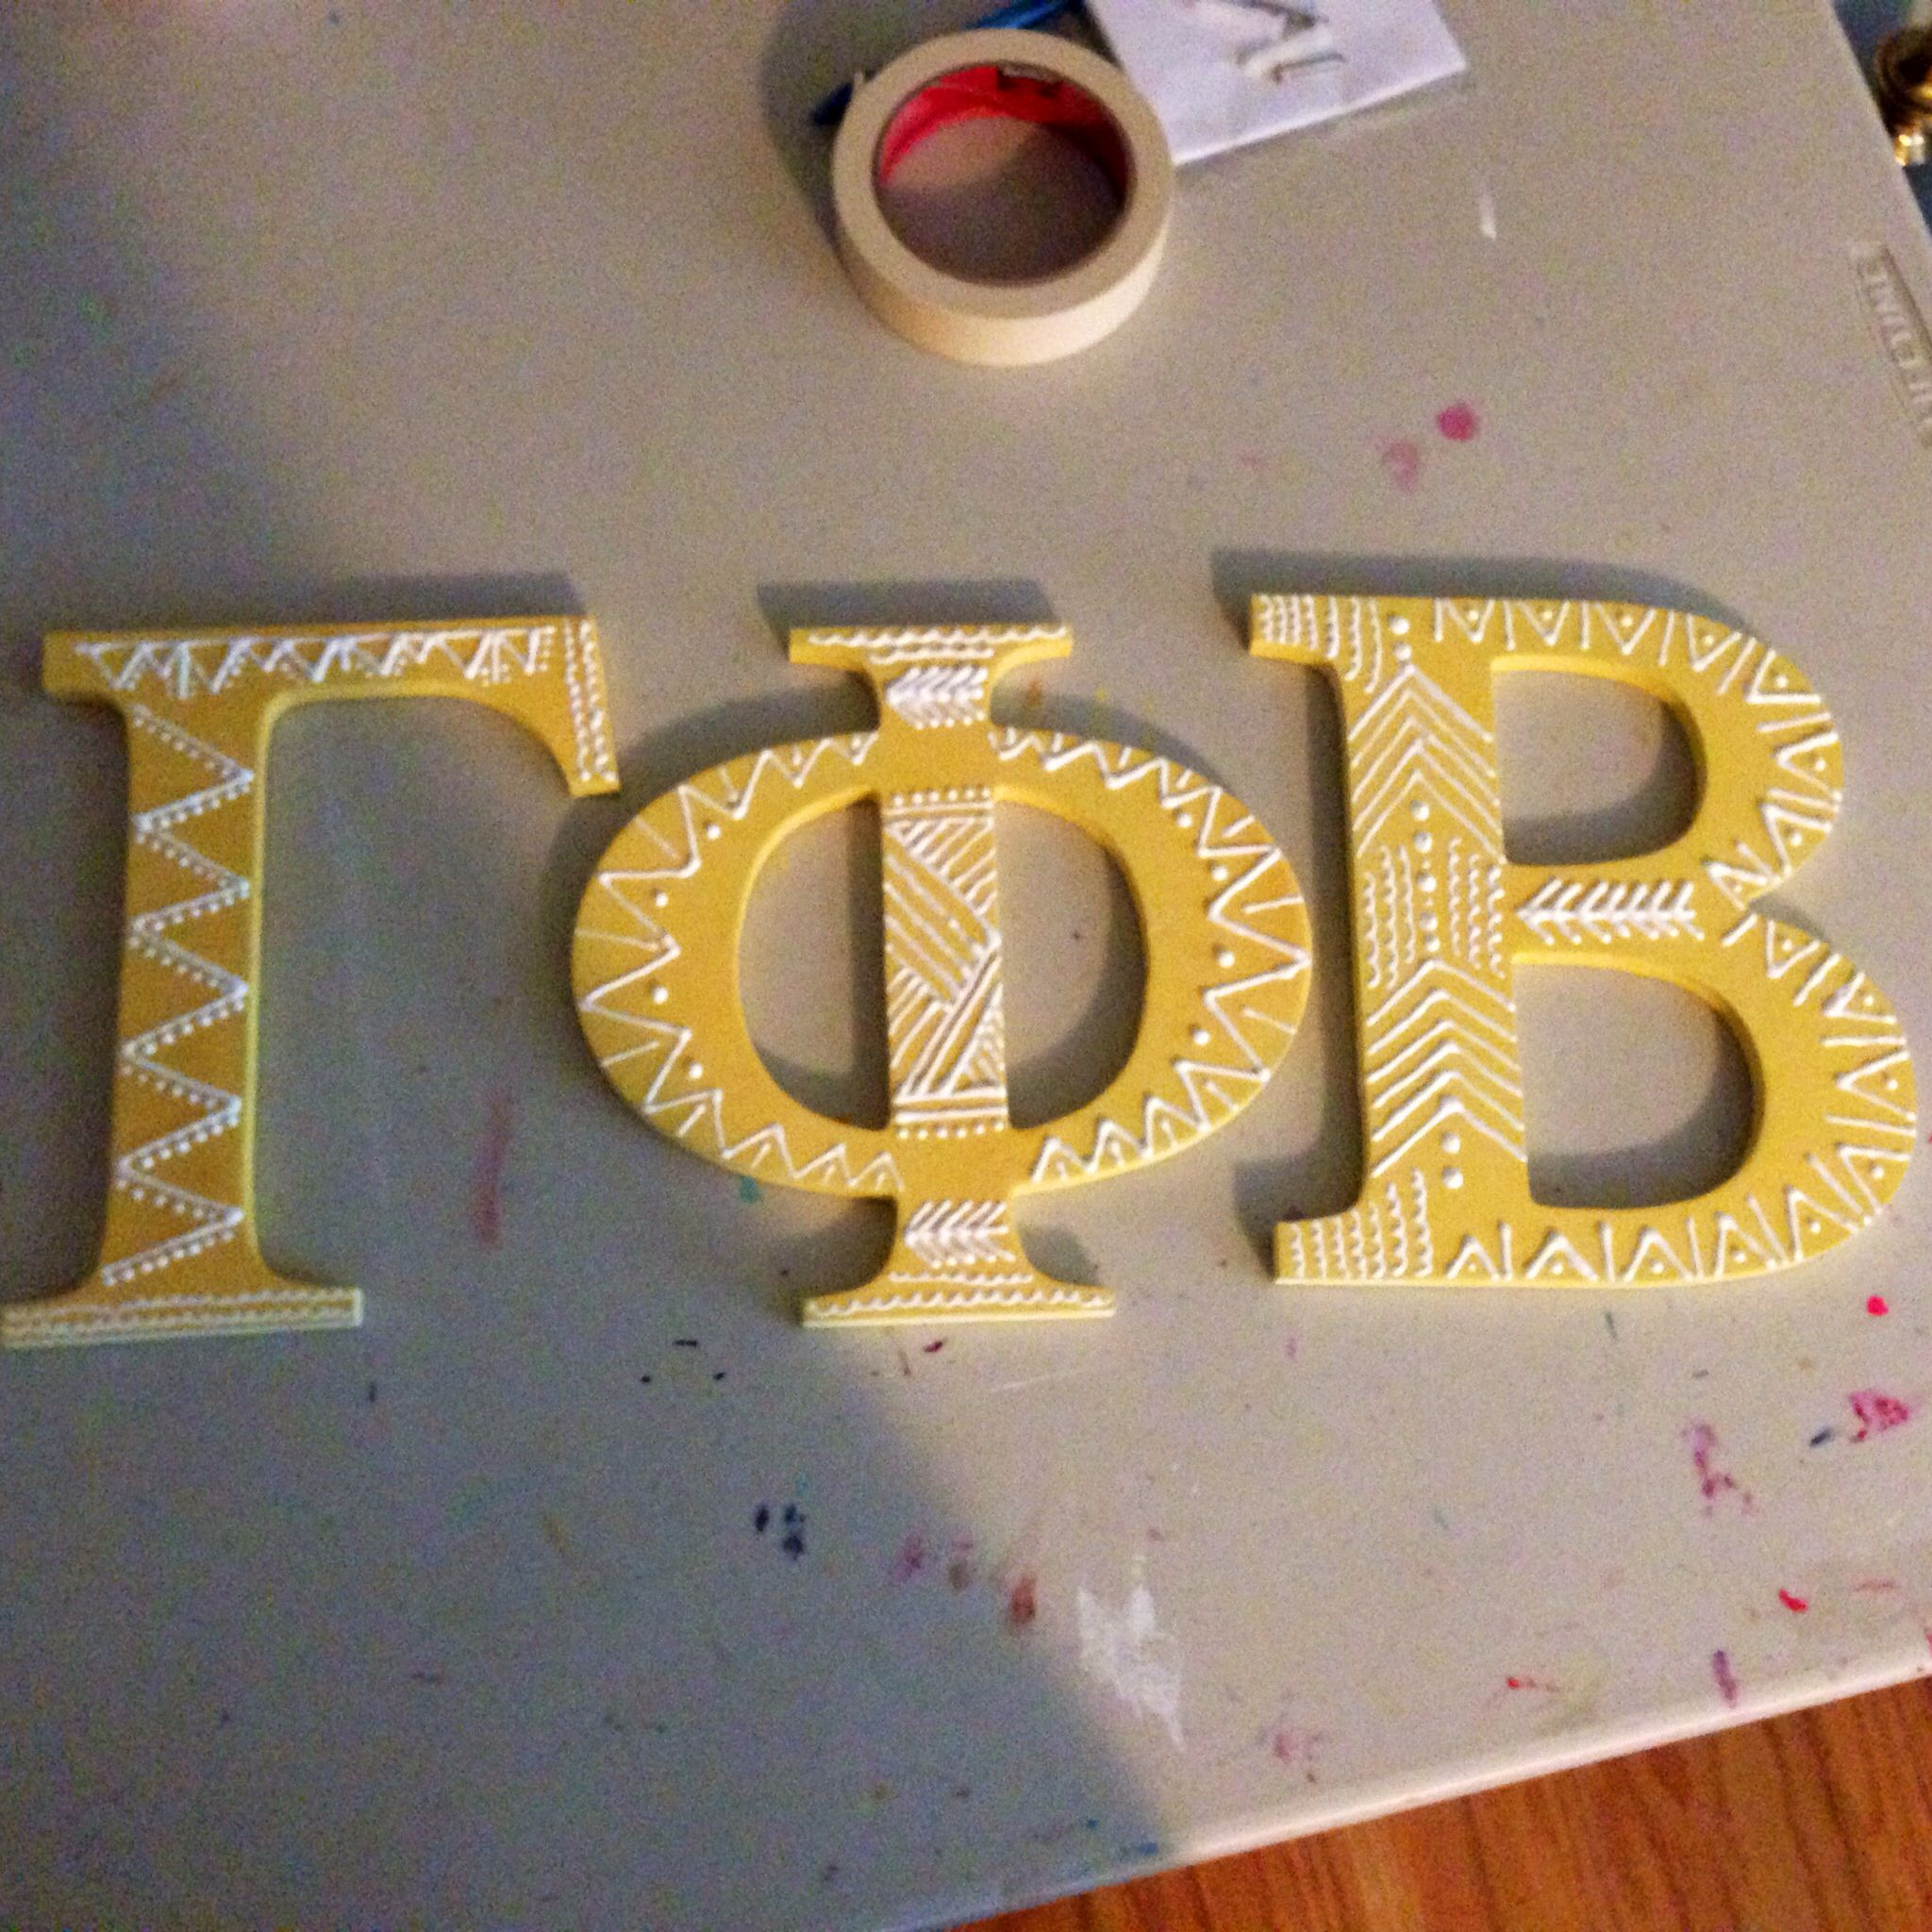 Gamma Phi Beta Sorority 7.5 Inch Unfinished Wood Letter Set Gamma phi